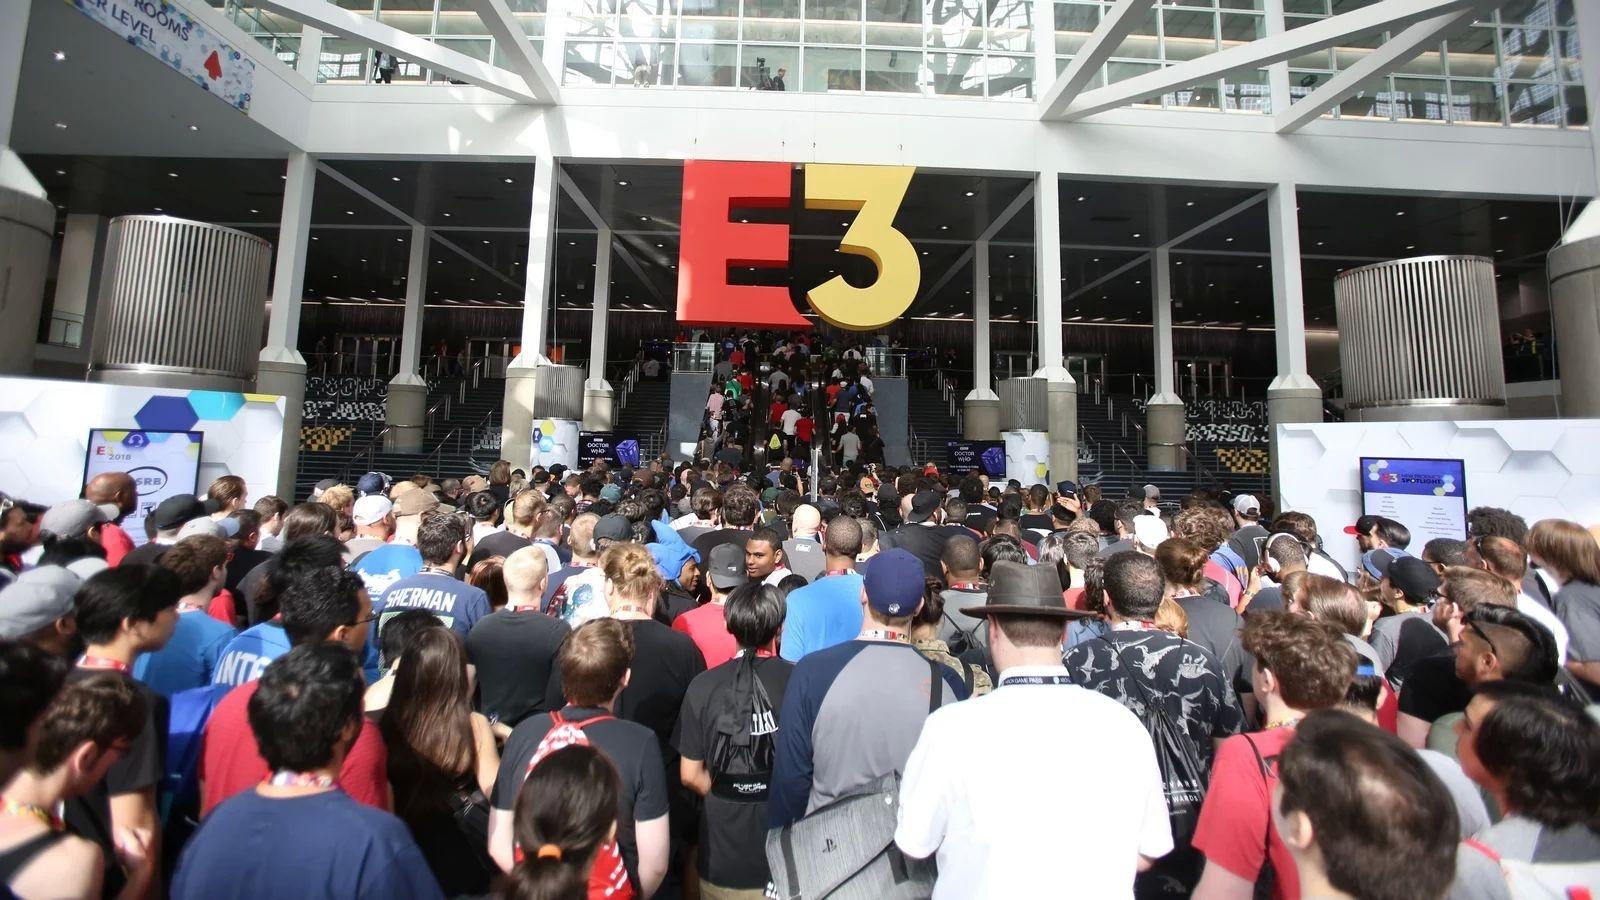 СМИ: E3 2021 пройдет в цифровом формате — с 15 по 17 июня